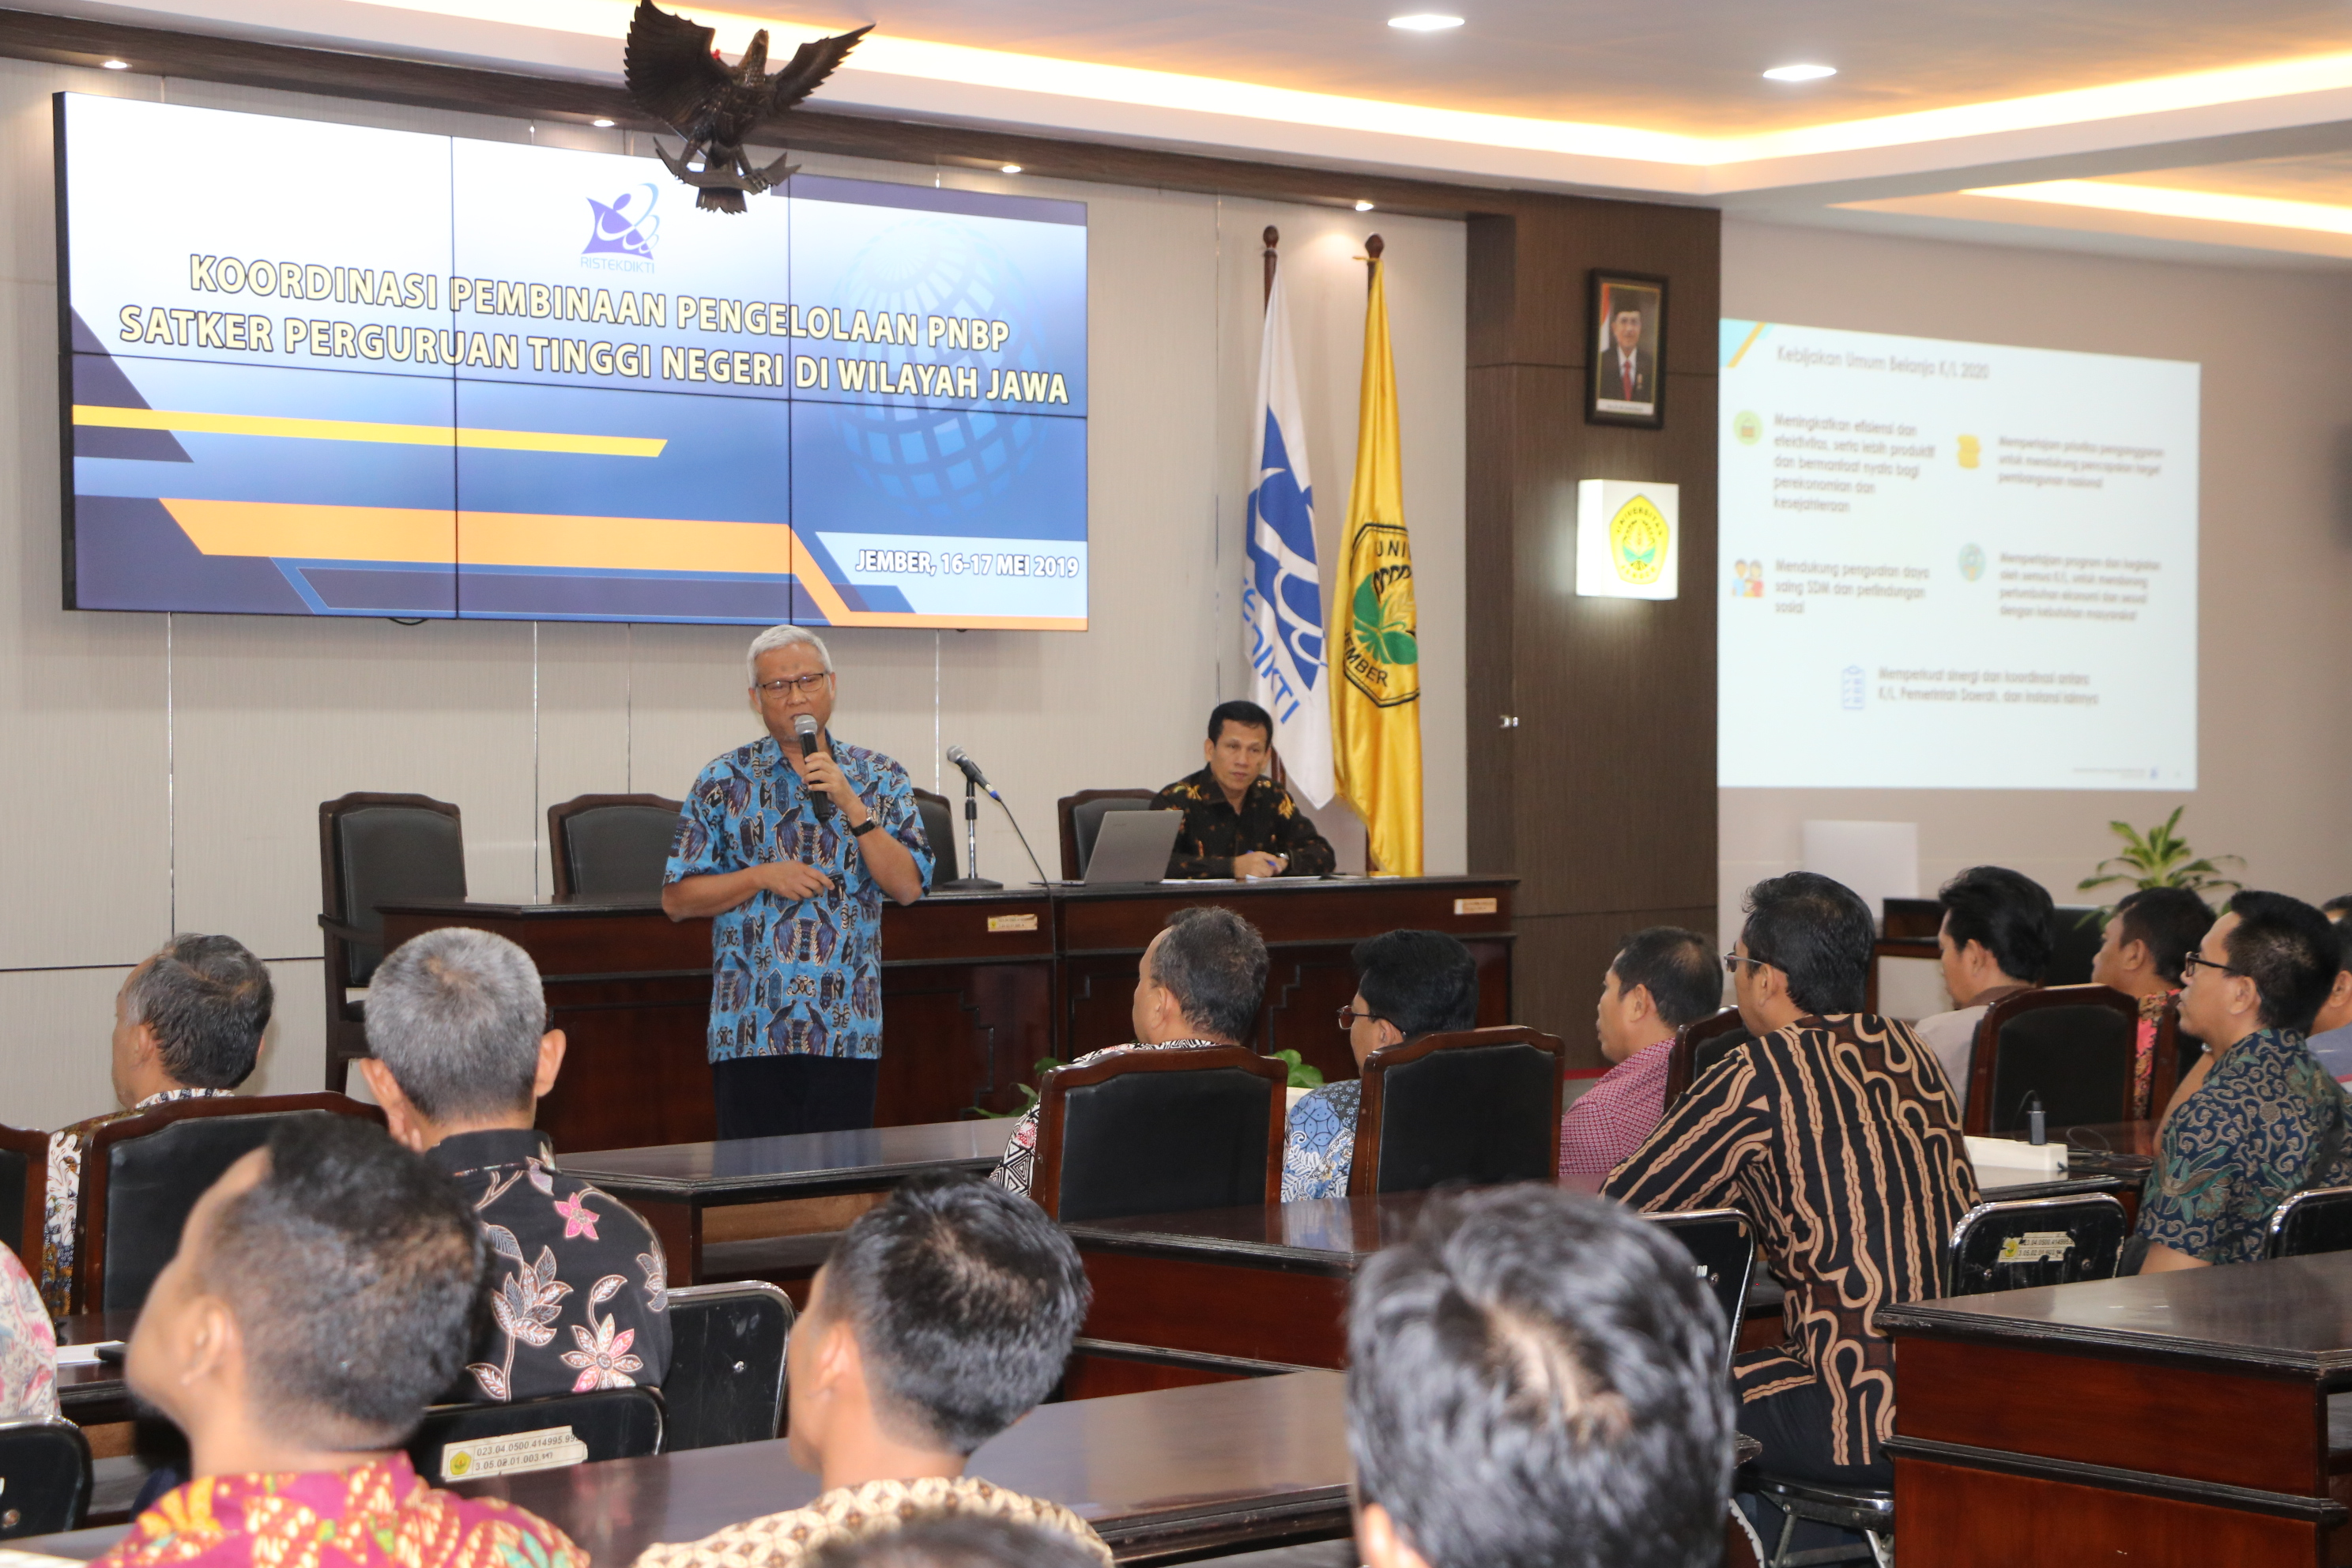 Enam Belas PTN Se Jawa Timur dan Jawa Tengah Berkumpul Di Kampus Tegalboto, Bahas Pengelolaan PNBP